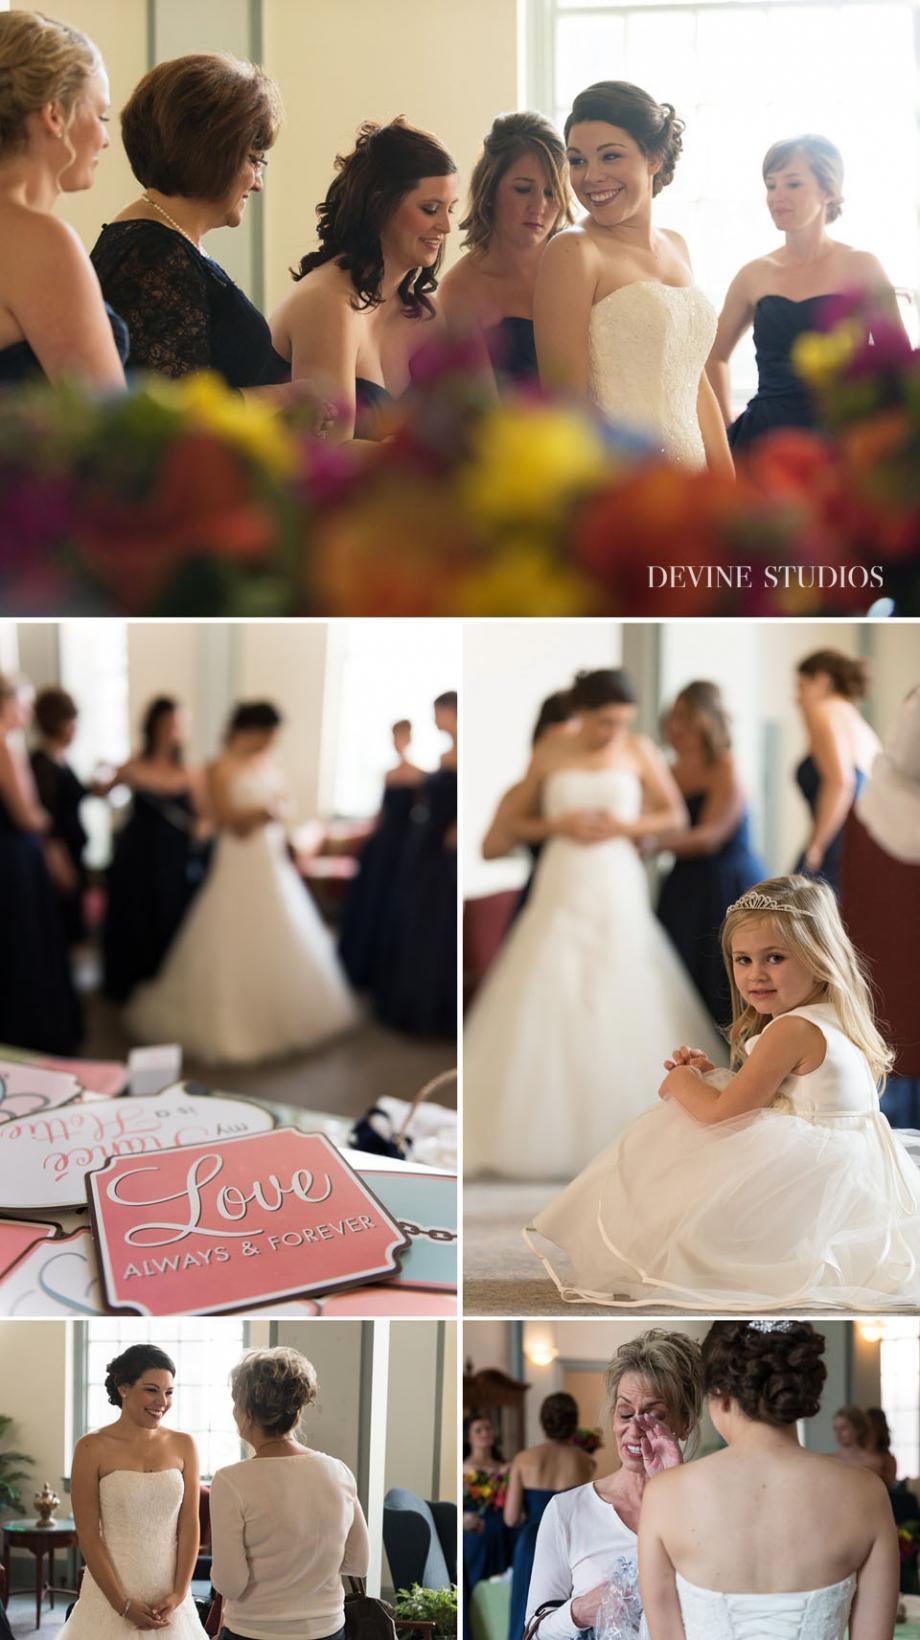 St. Joseph-Wedding-Photography-Kansas City-Photographers-Devine Studios 3